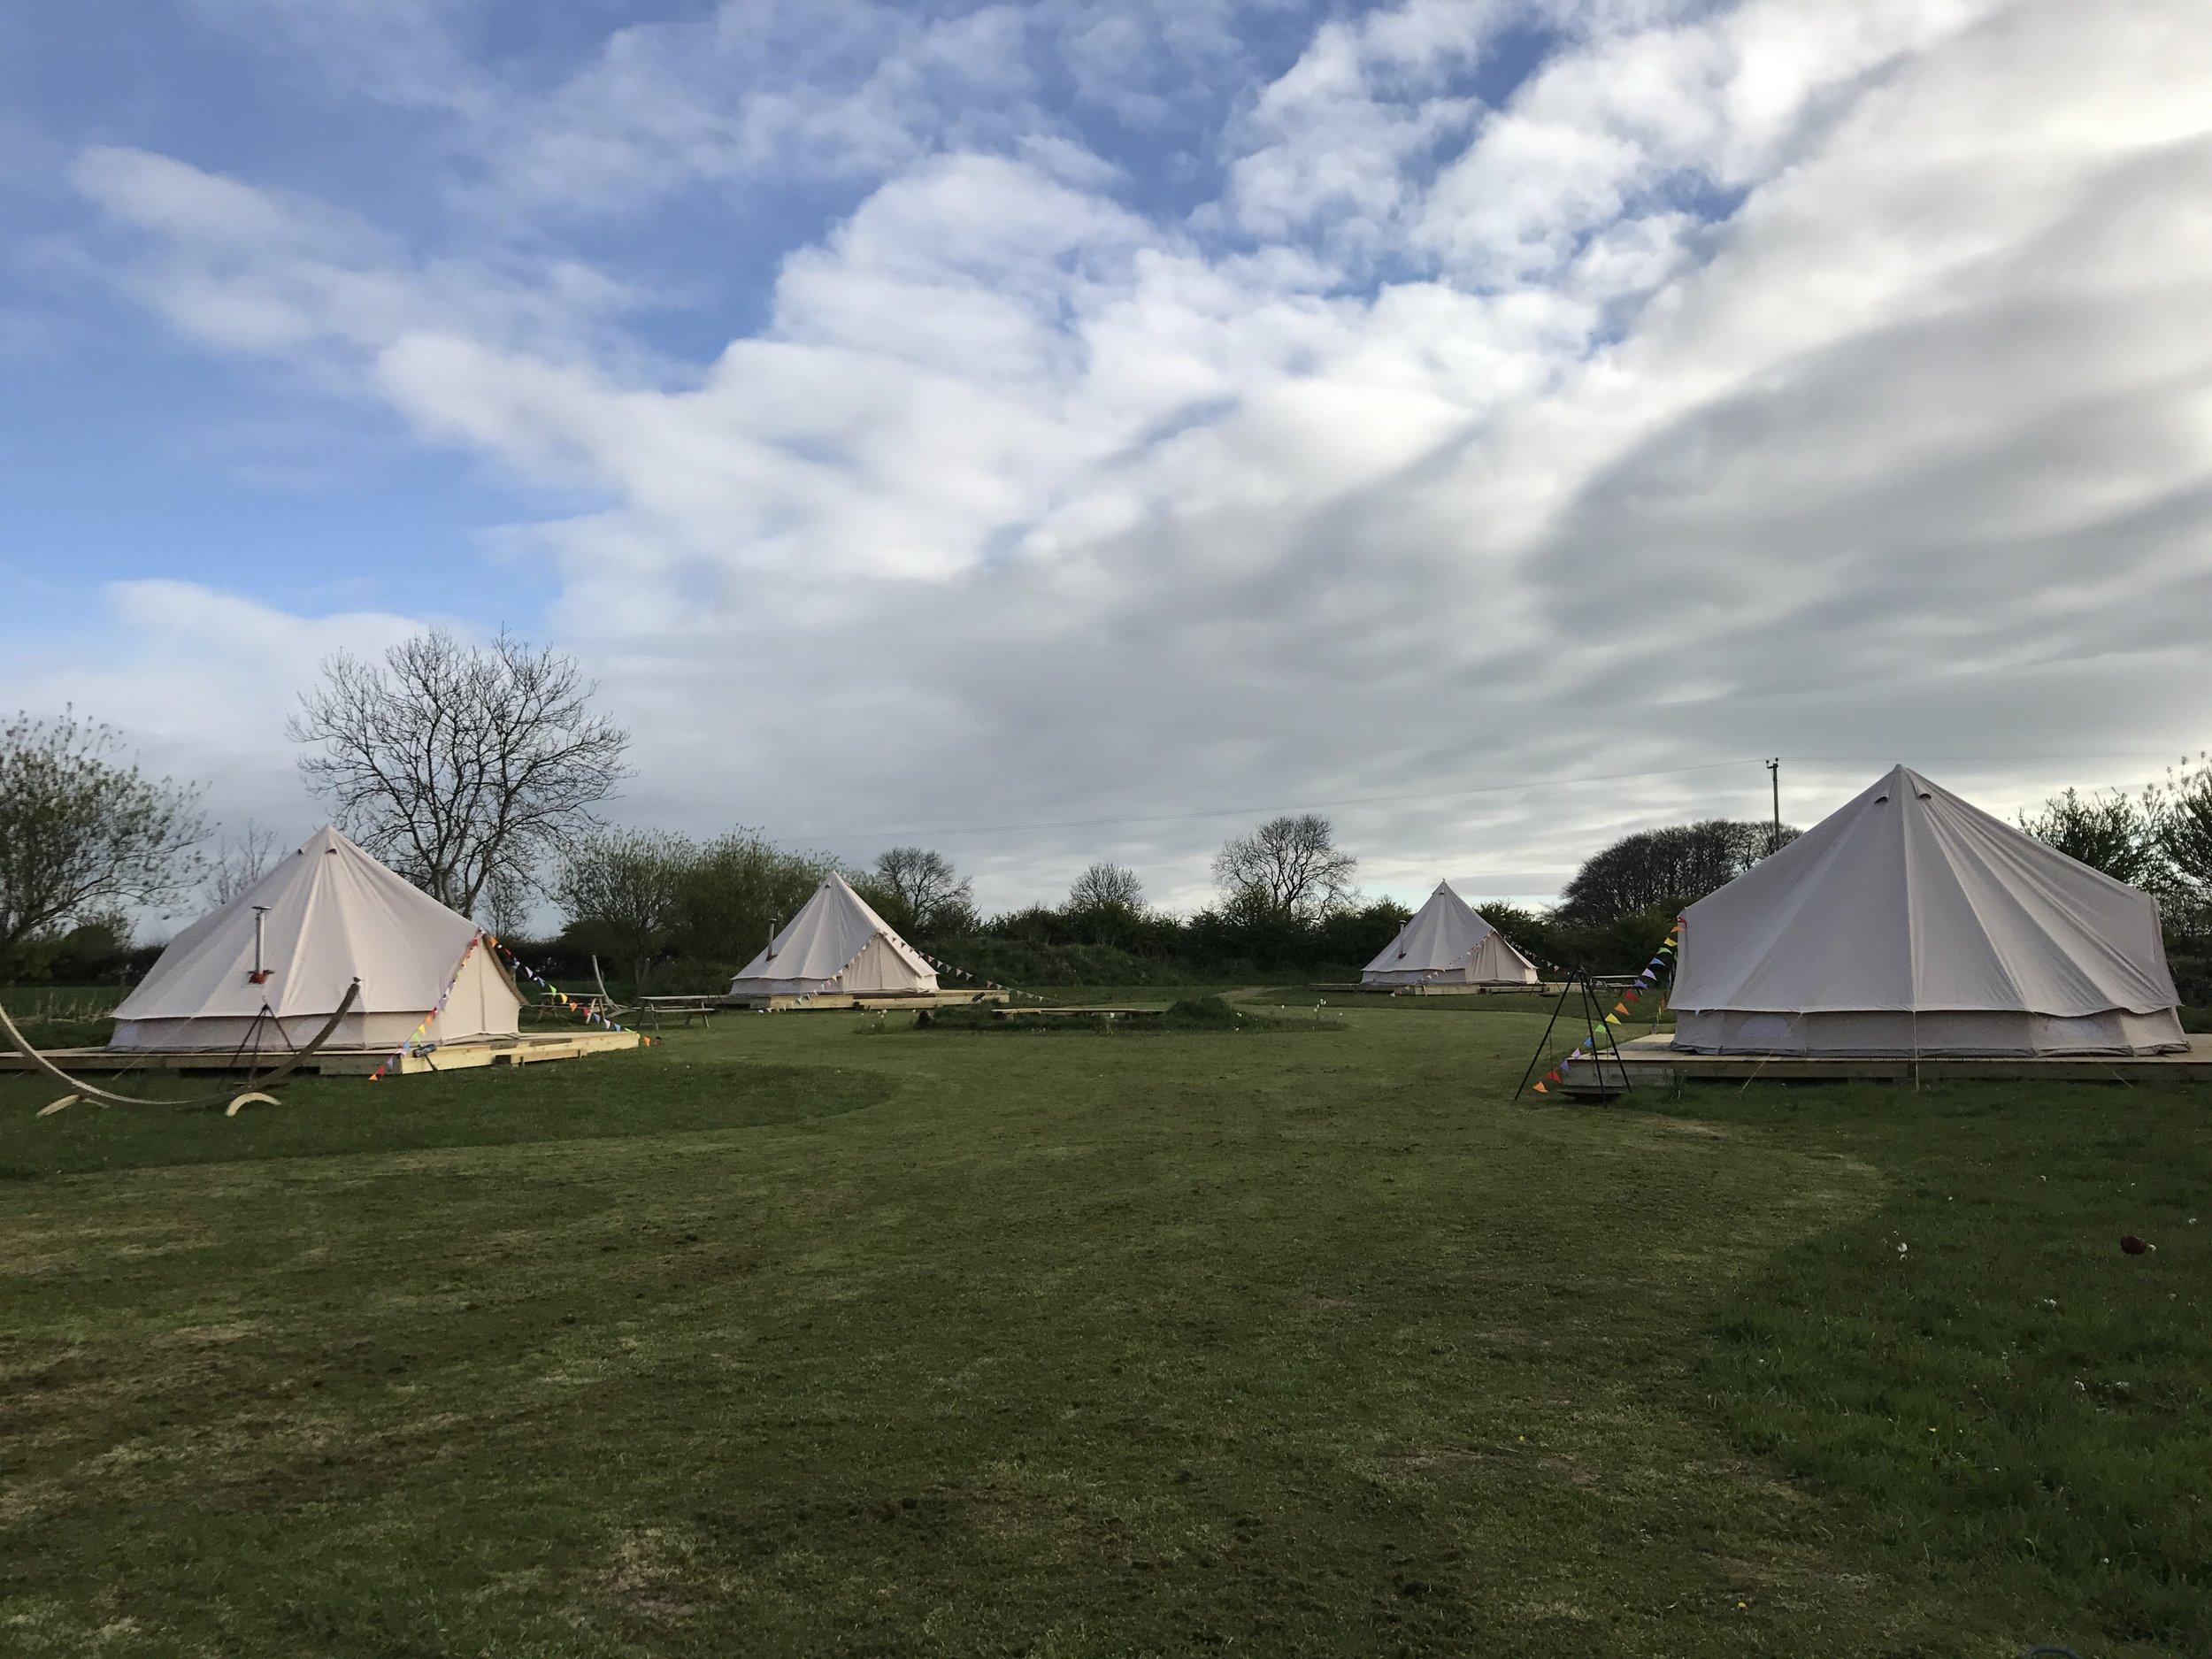 Our four tents, Burrington, Cheddar, Ebbor and George